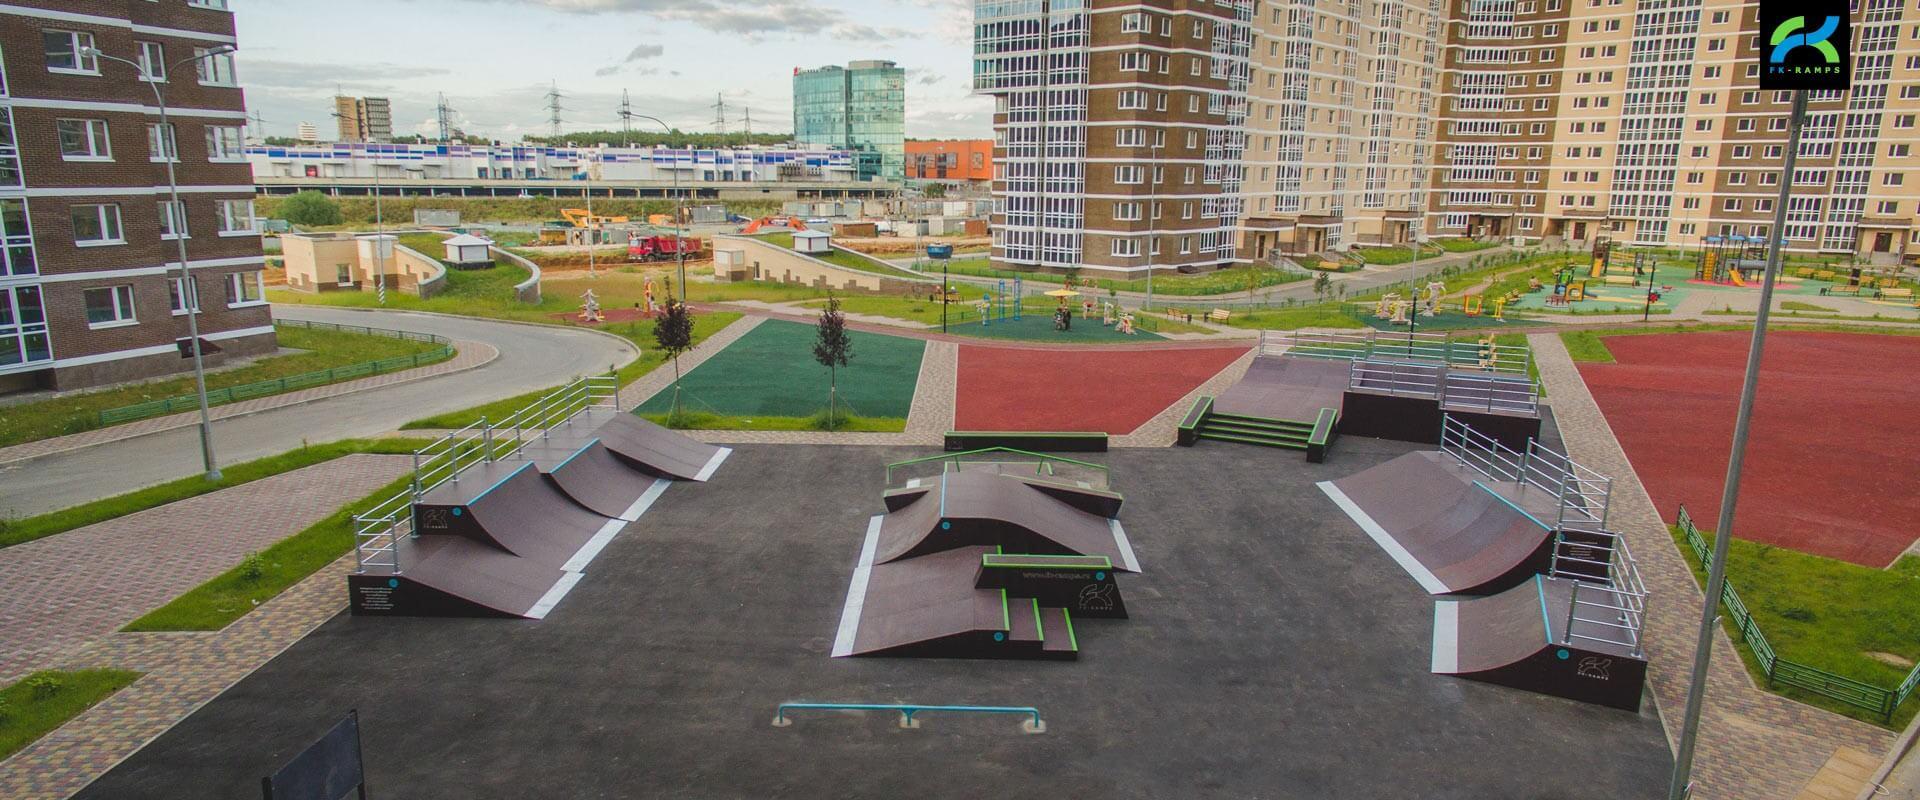 Скейт парки для архитекторов - FK-ramps